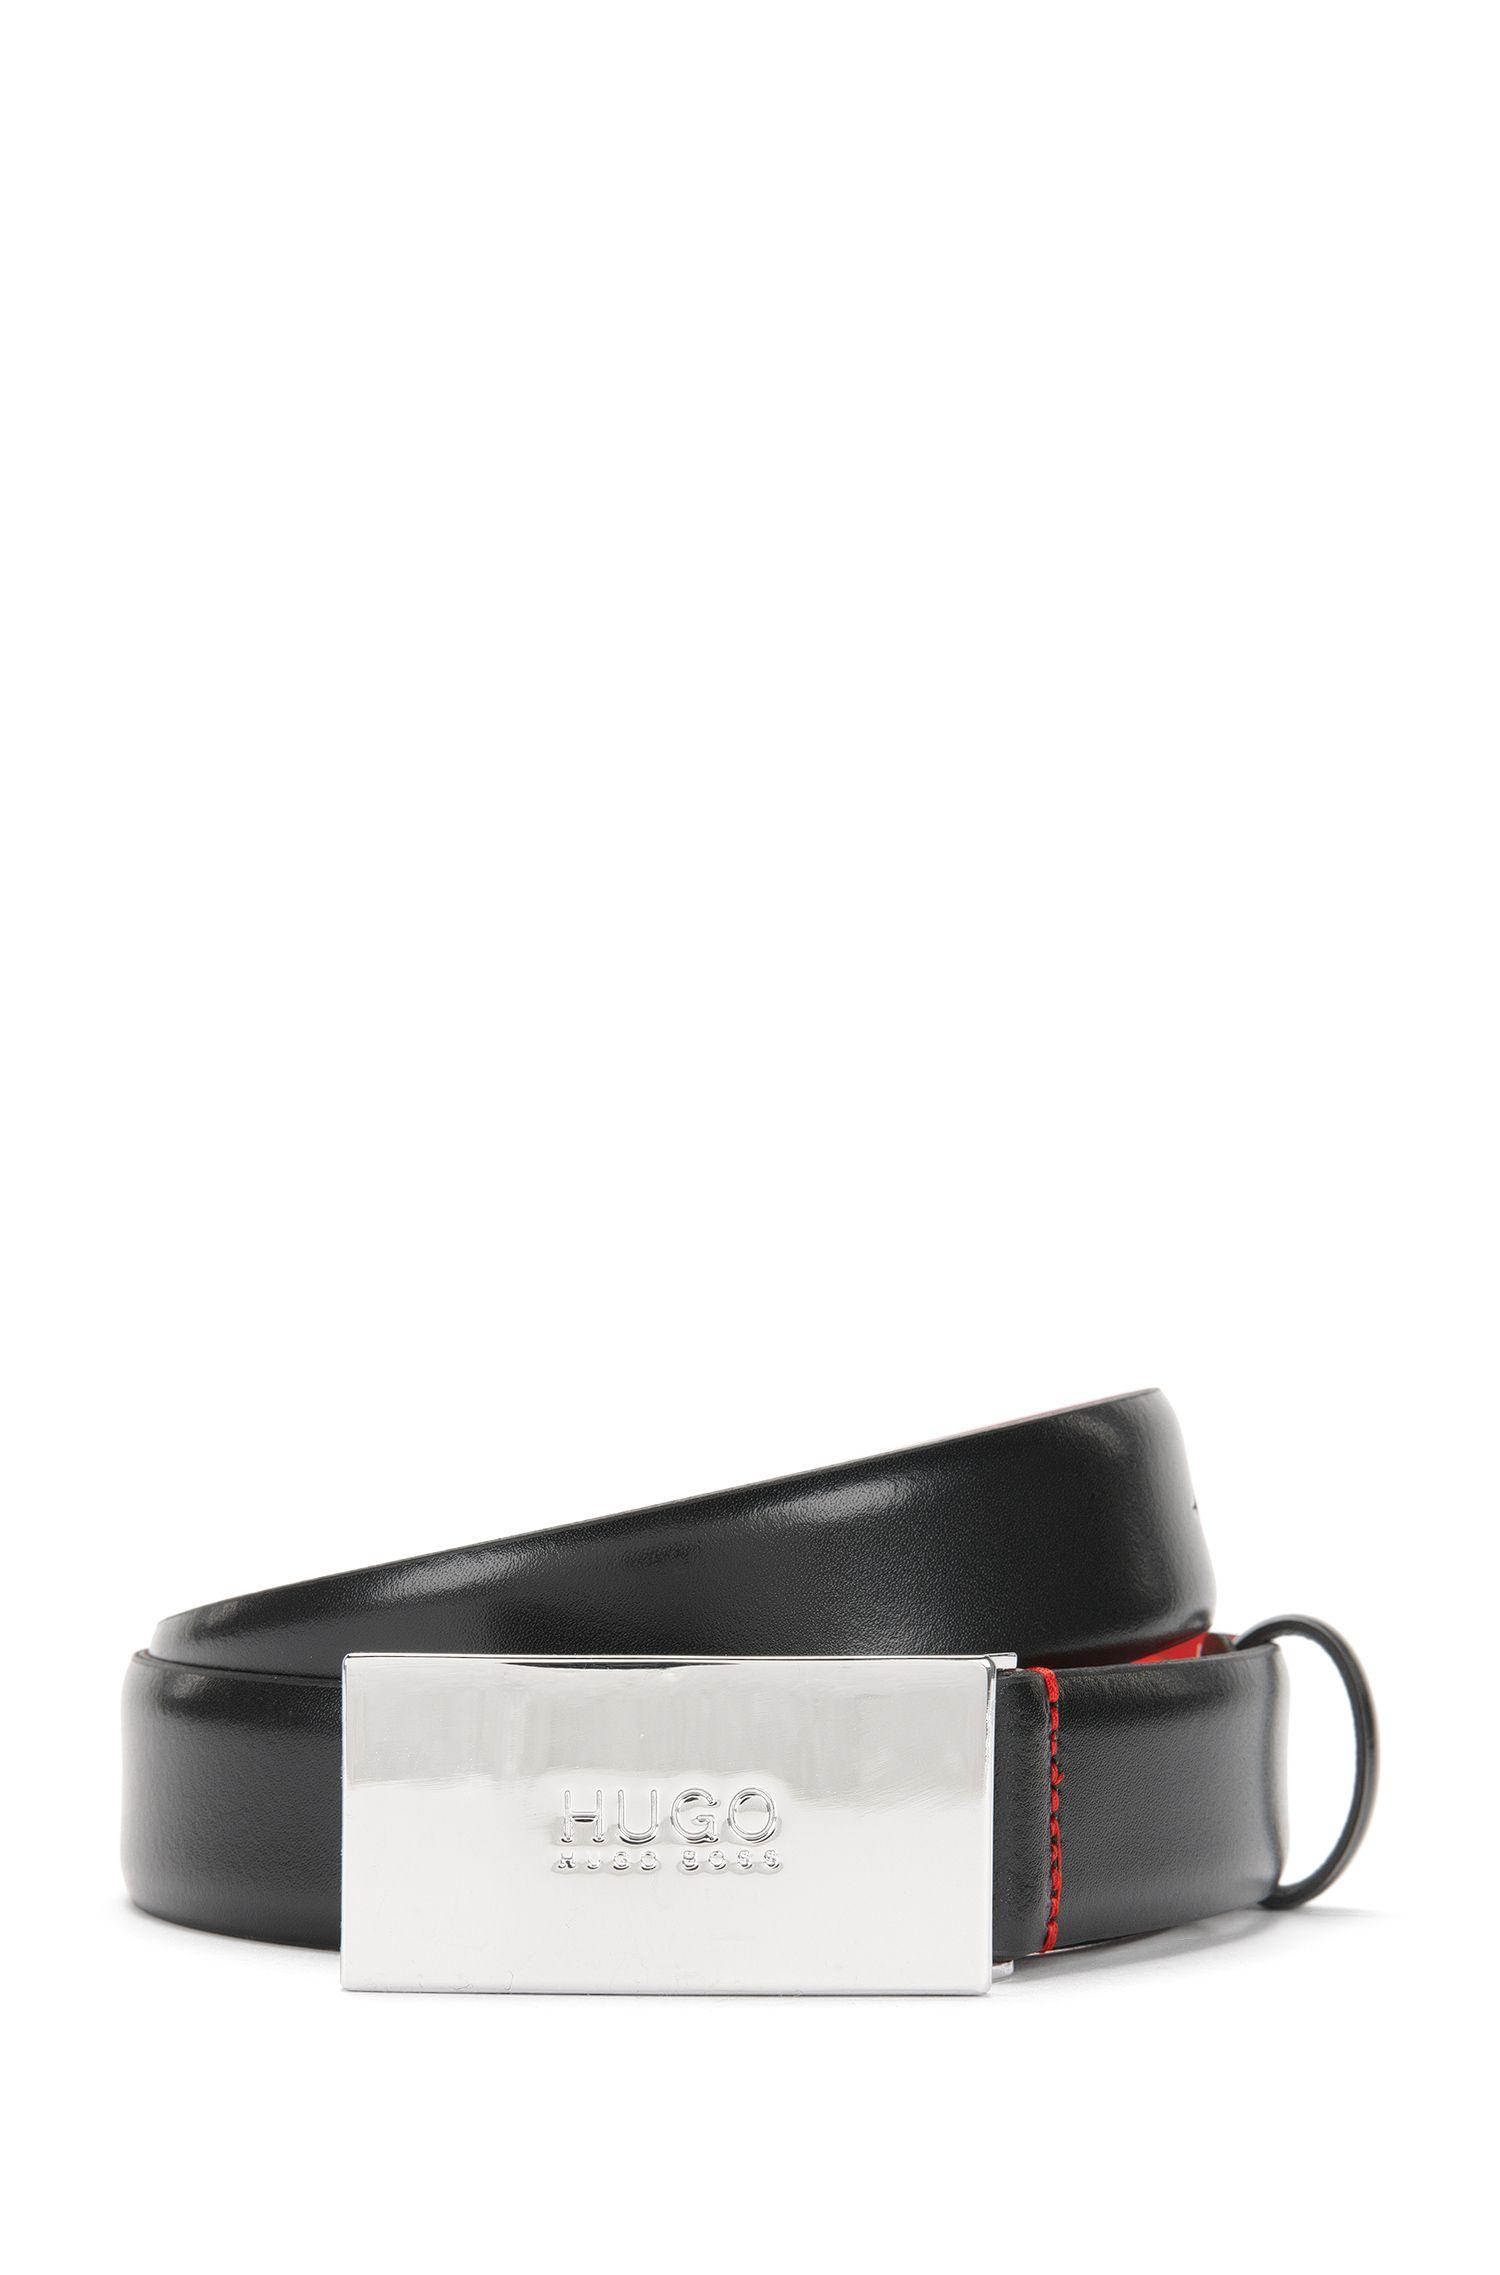 Ledergürtel mit Metallschließe mit Logogravur: ´BALDWIN-N`